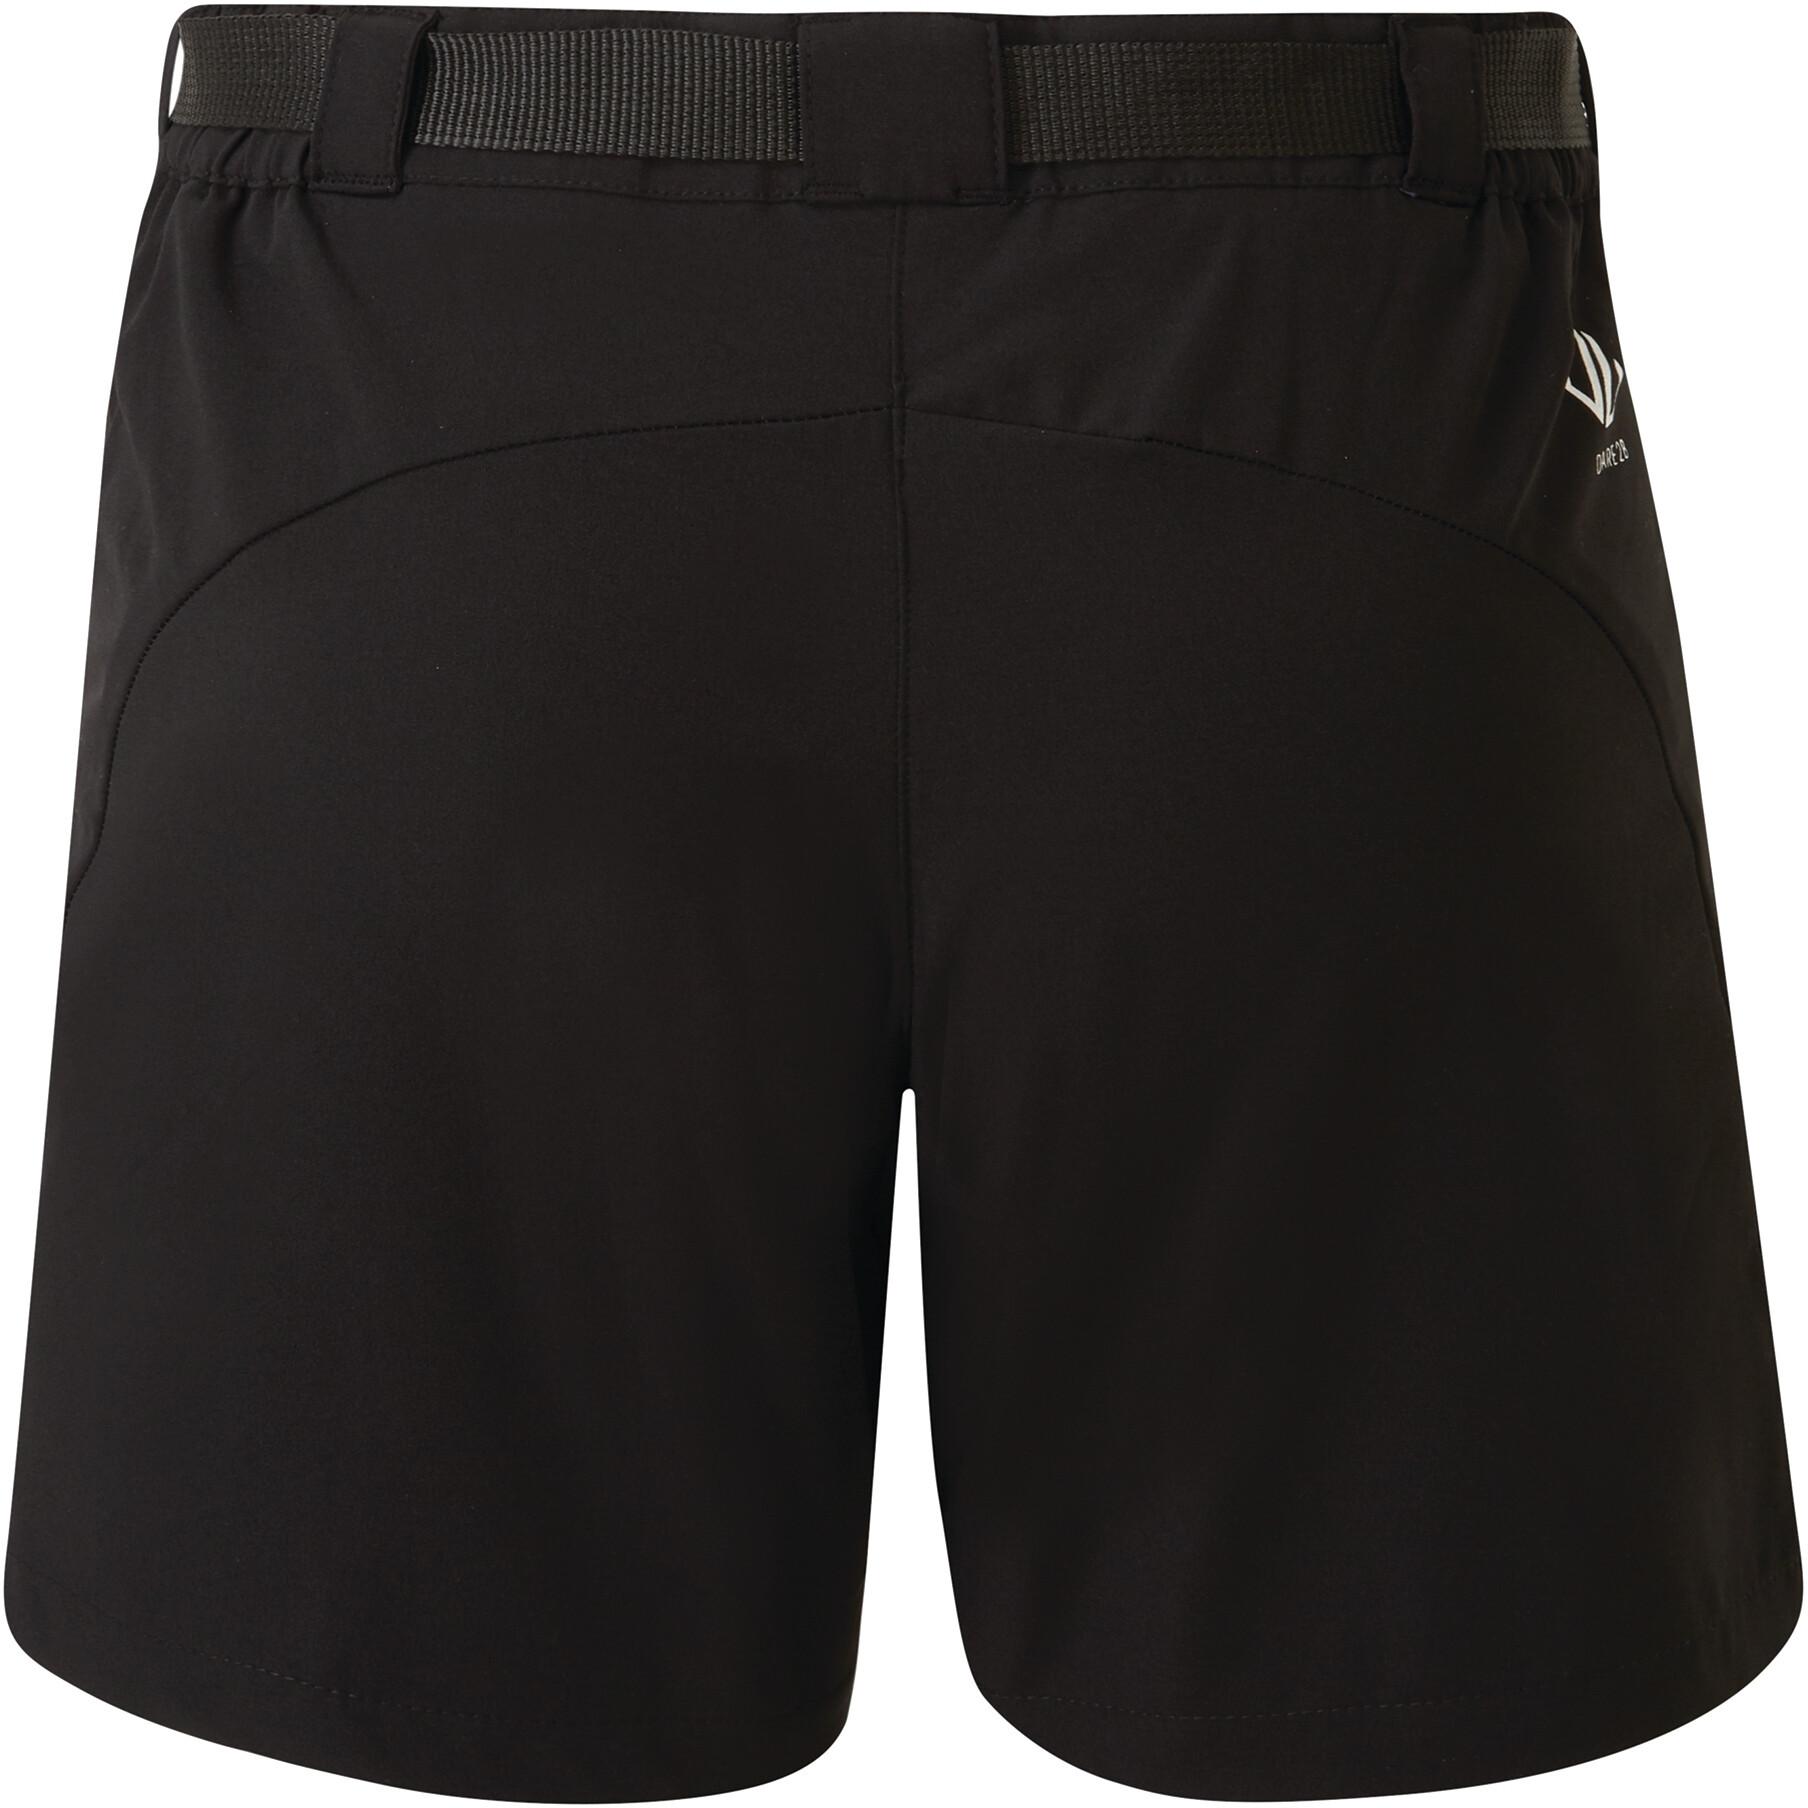 Dare 2b Revify II Shorts Damen black